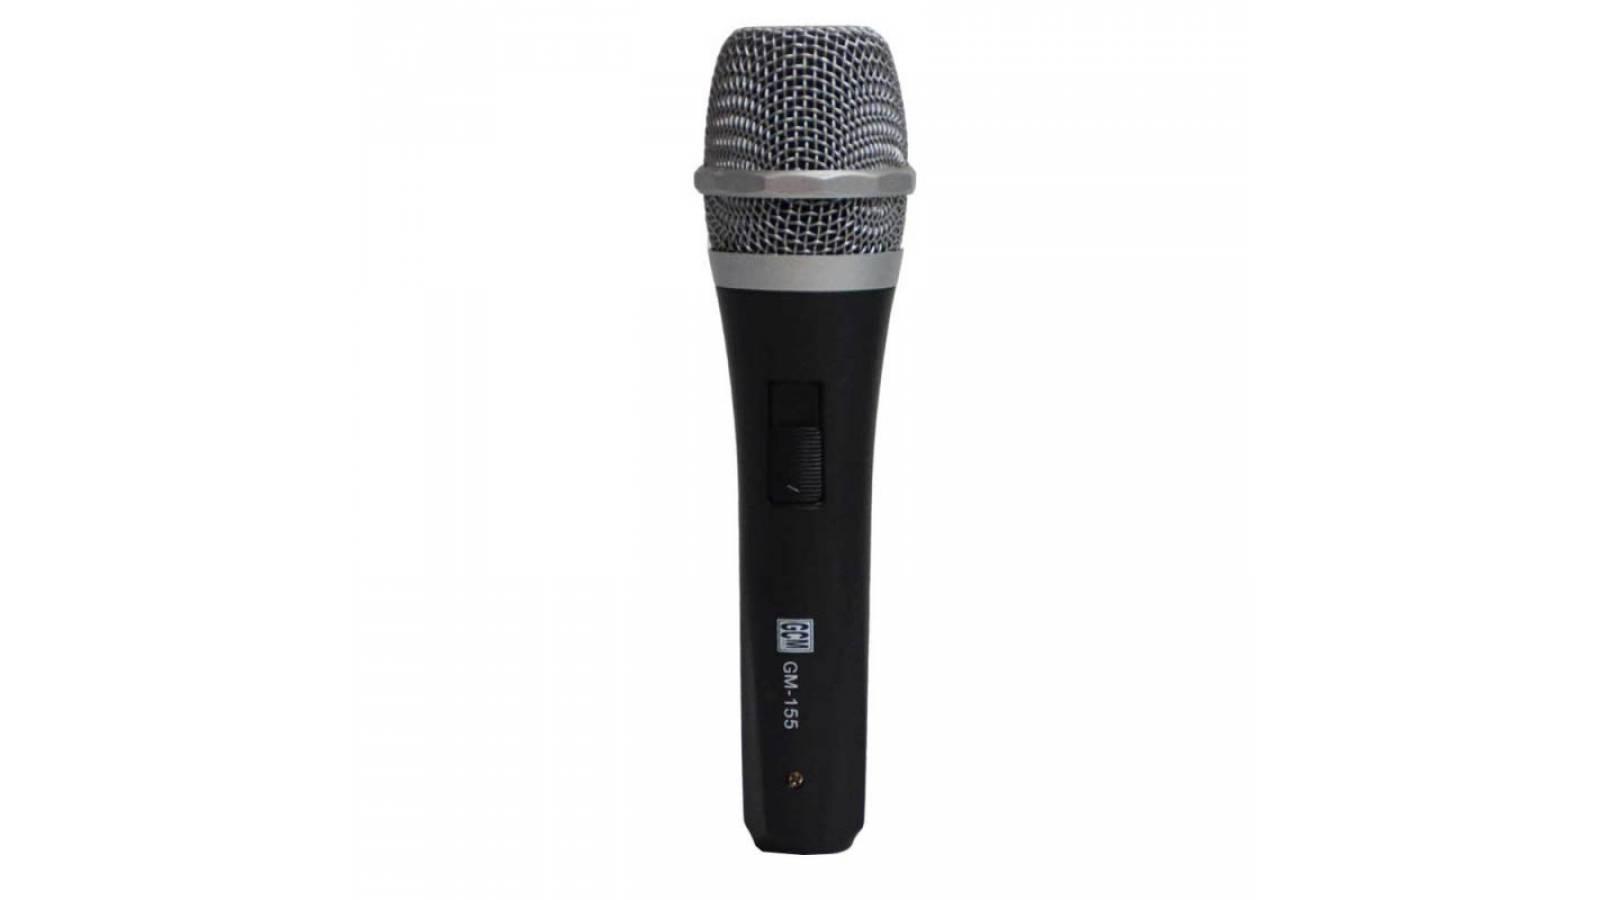 Micrófono Alámbrico / Cableado / Dinámico, Ideal para Karaoke GM-155